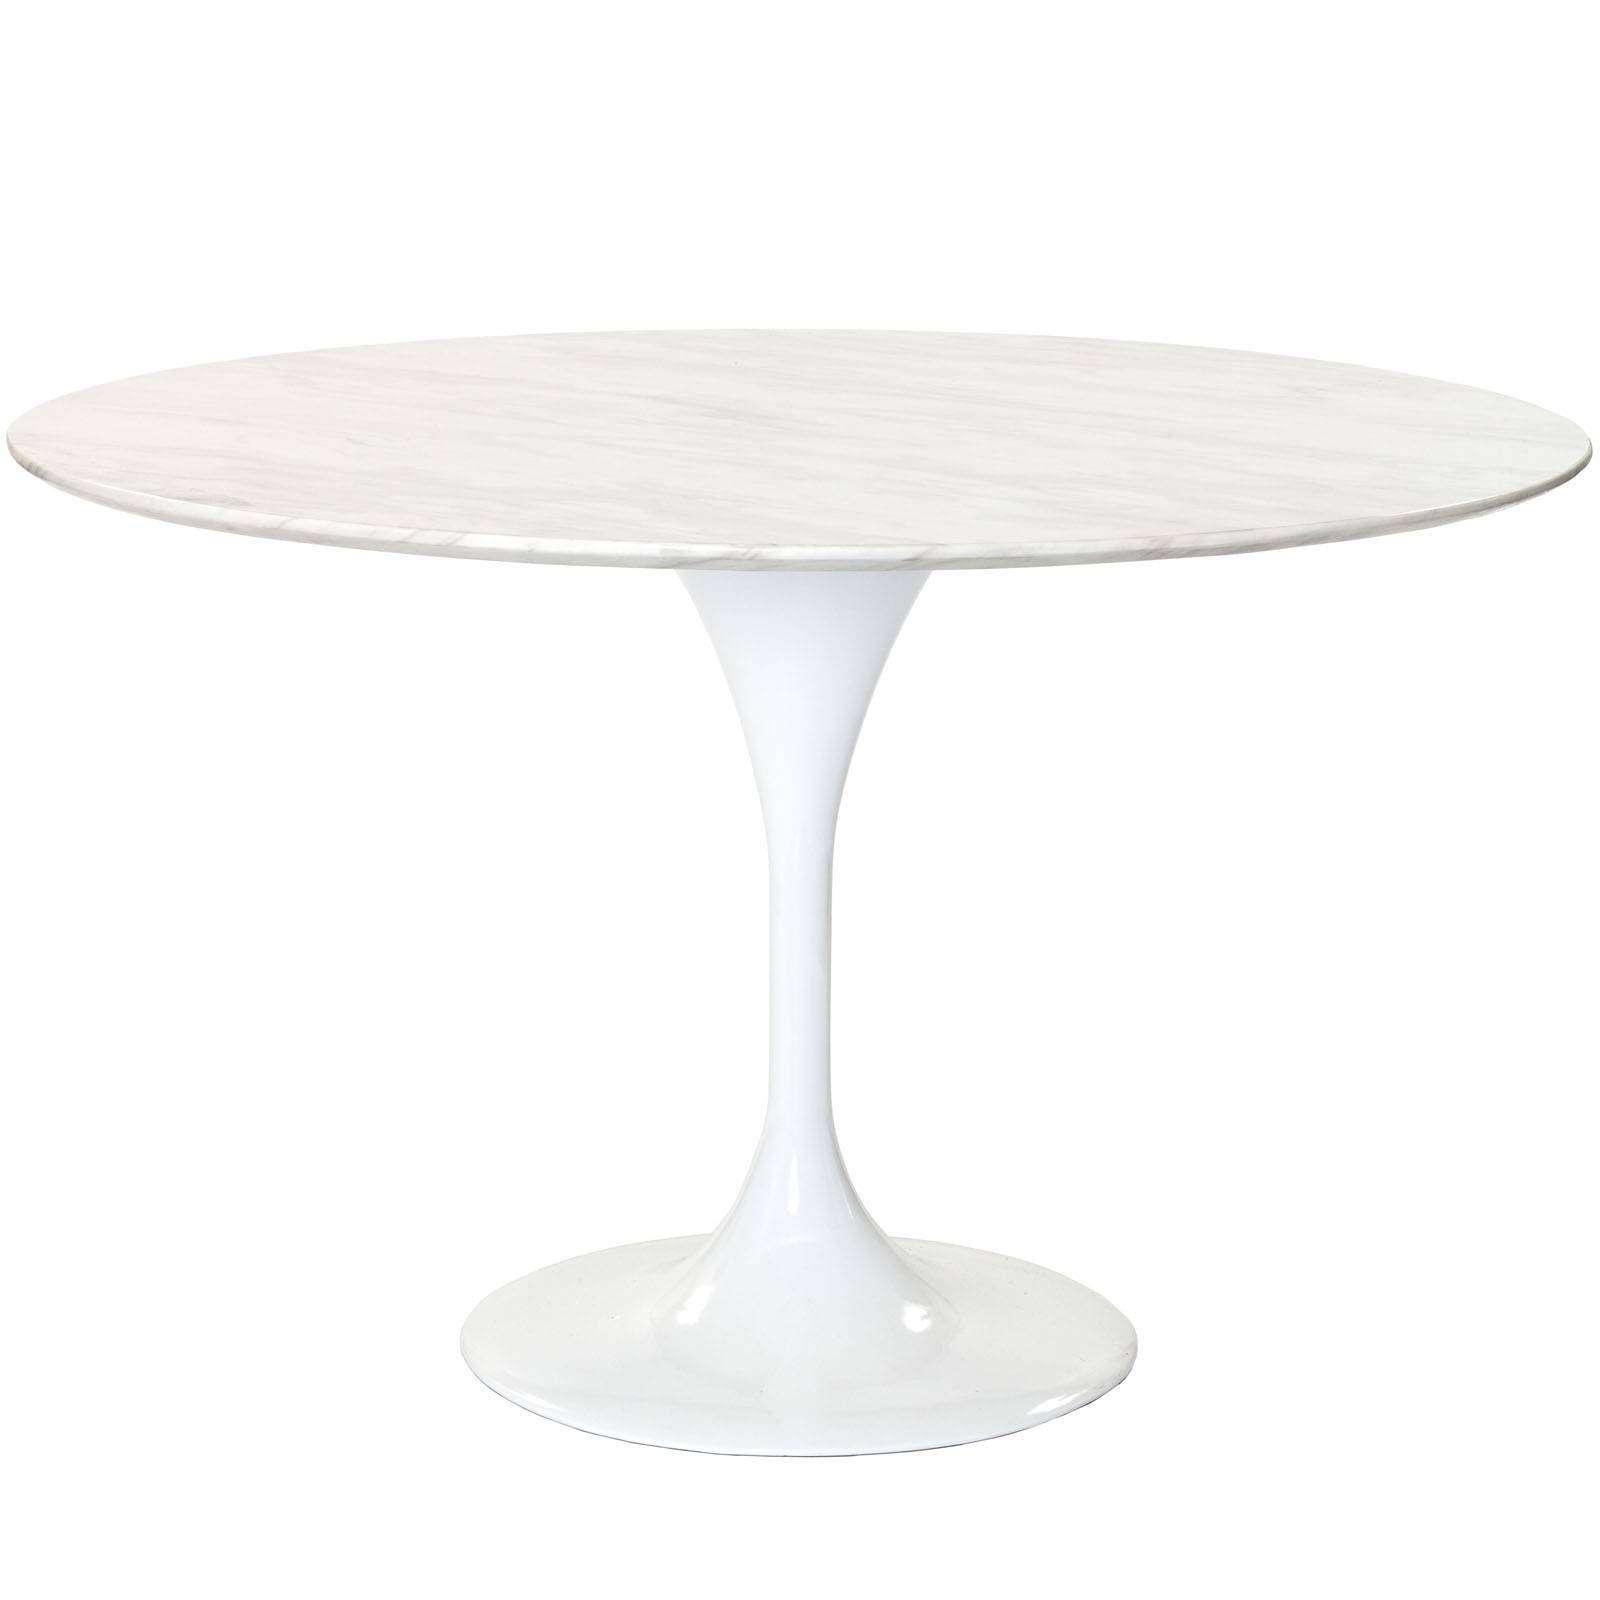 Eero Saarinen Style Tulip Table Marble 48quot : EEI 143 WHI1 from www.modterior.com size 1600 x 1600 jpeg 103kB